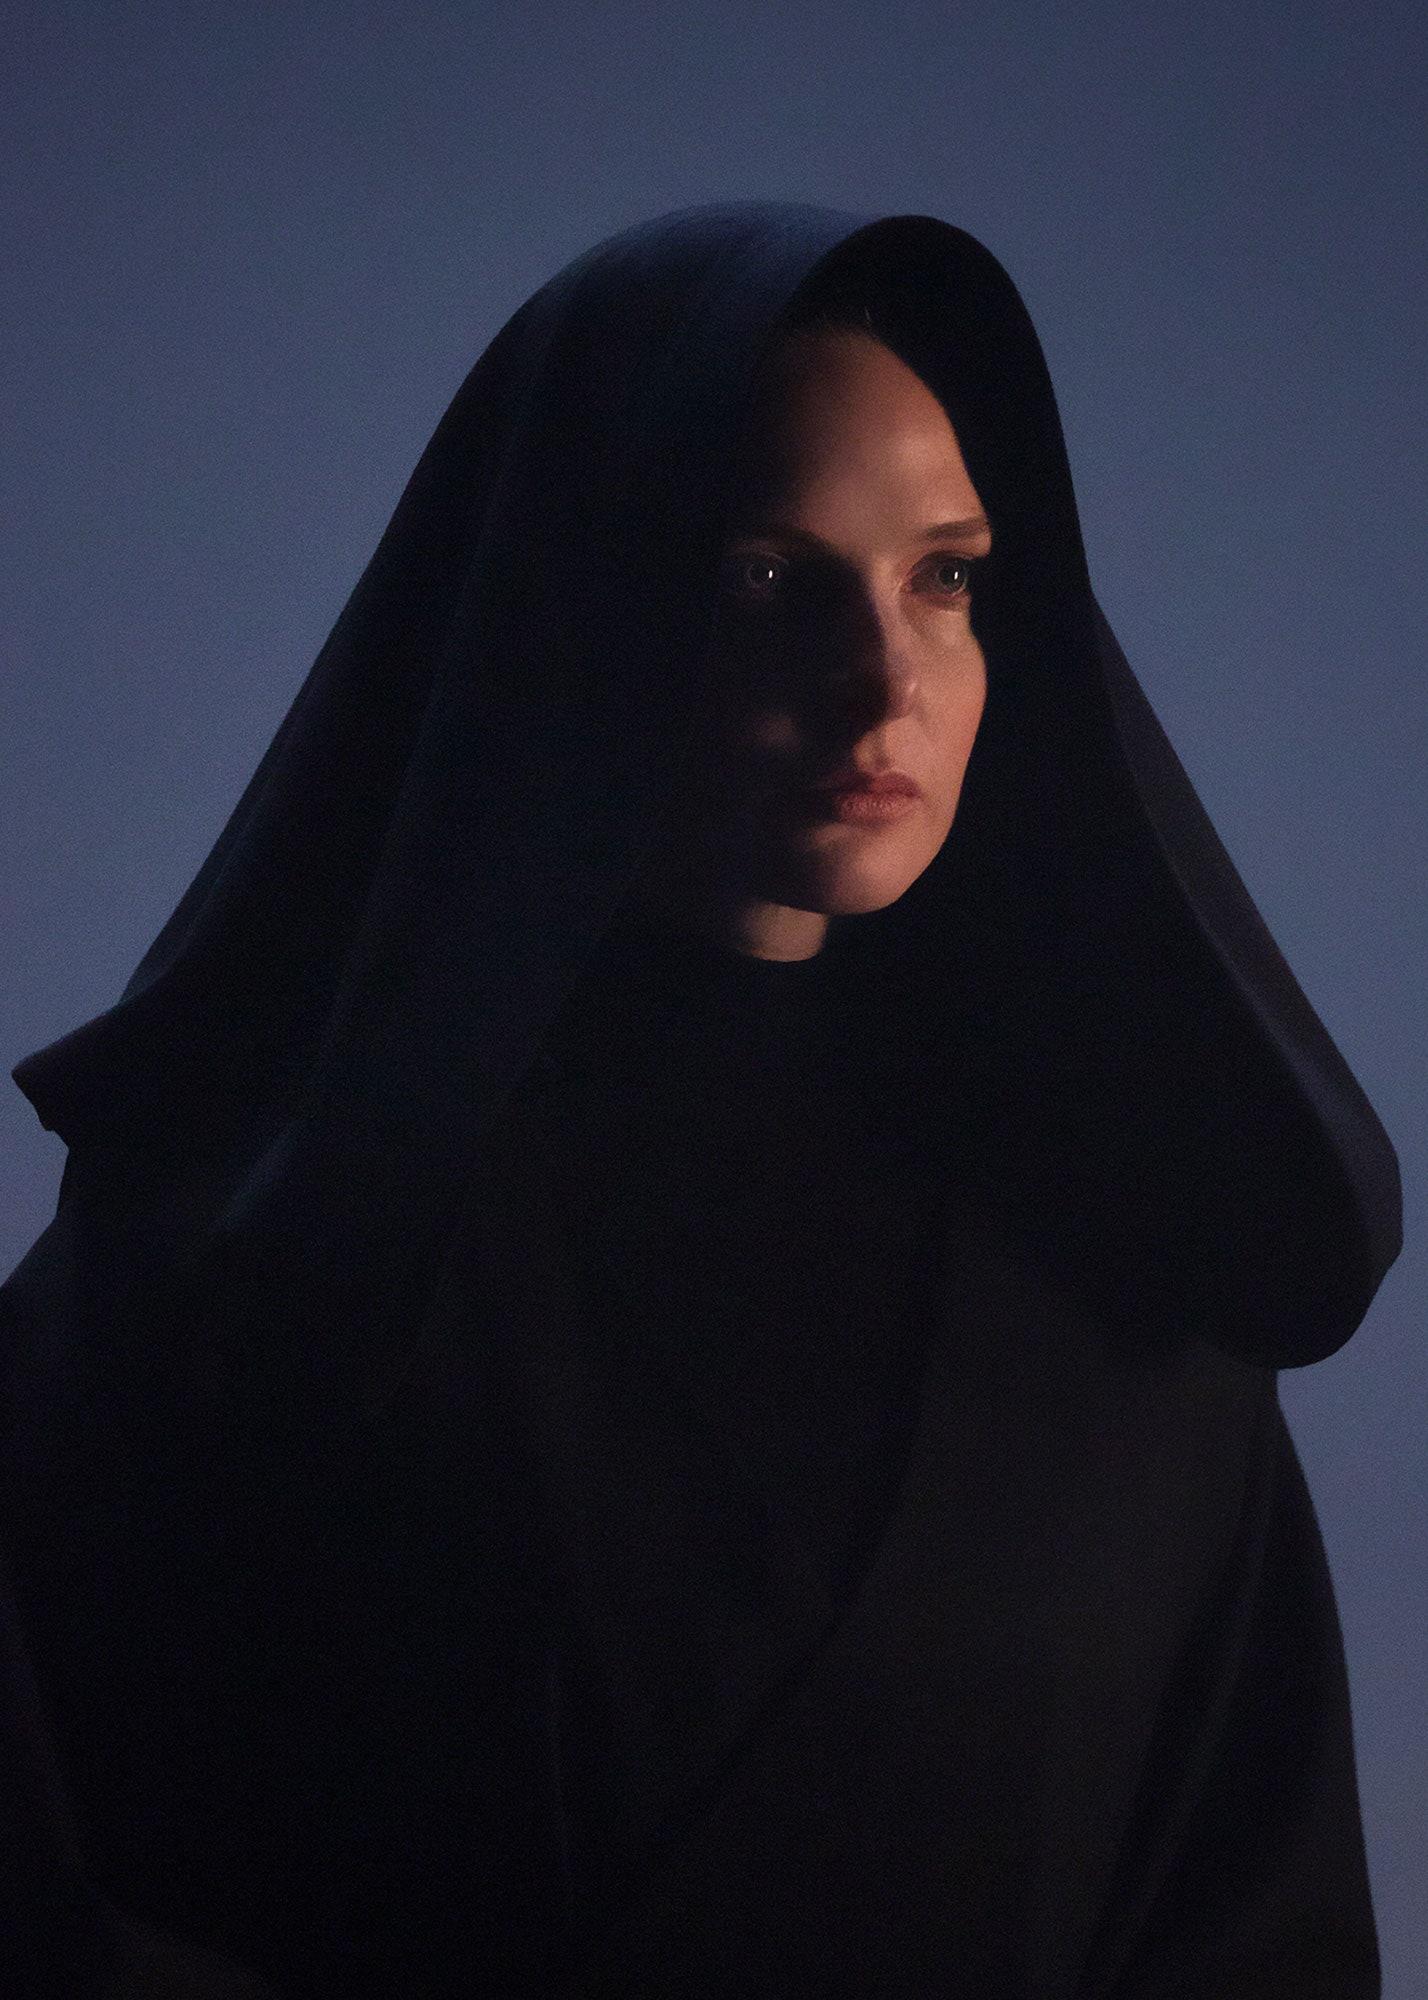 Dune-2020-Rebecca-Ferguson-as-Lady-Jessica